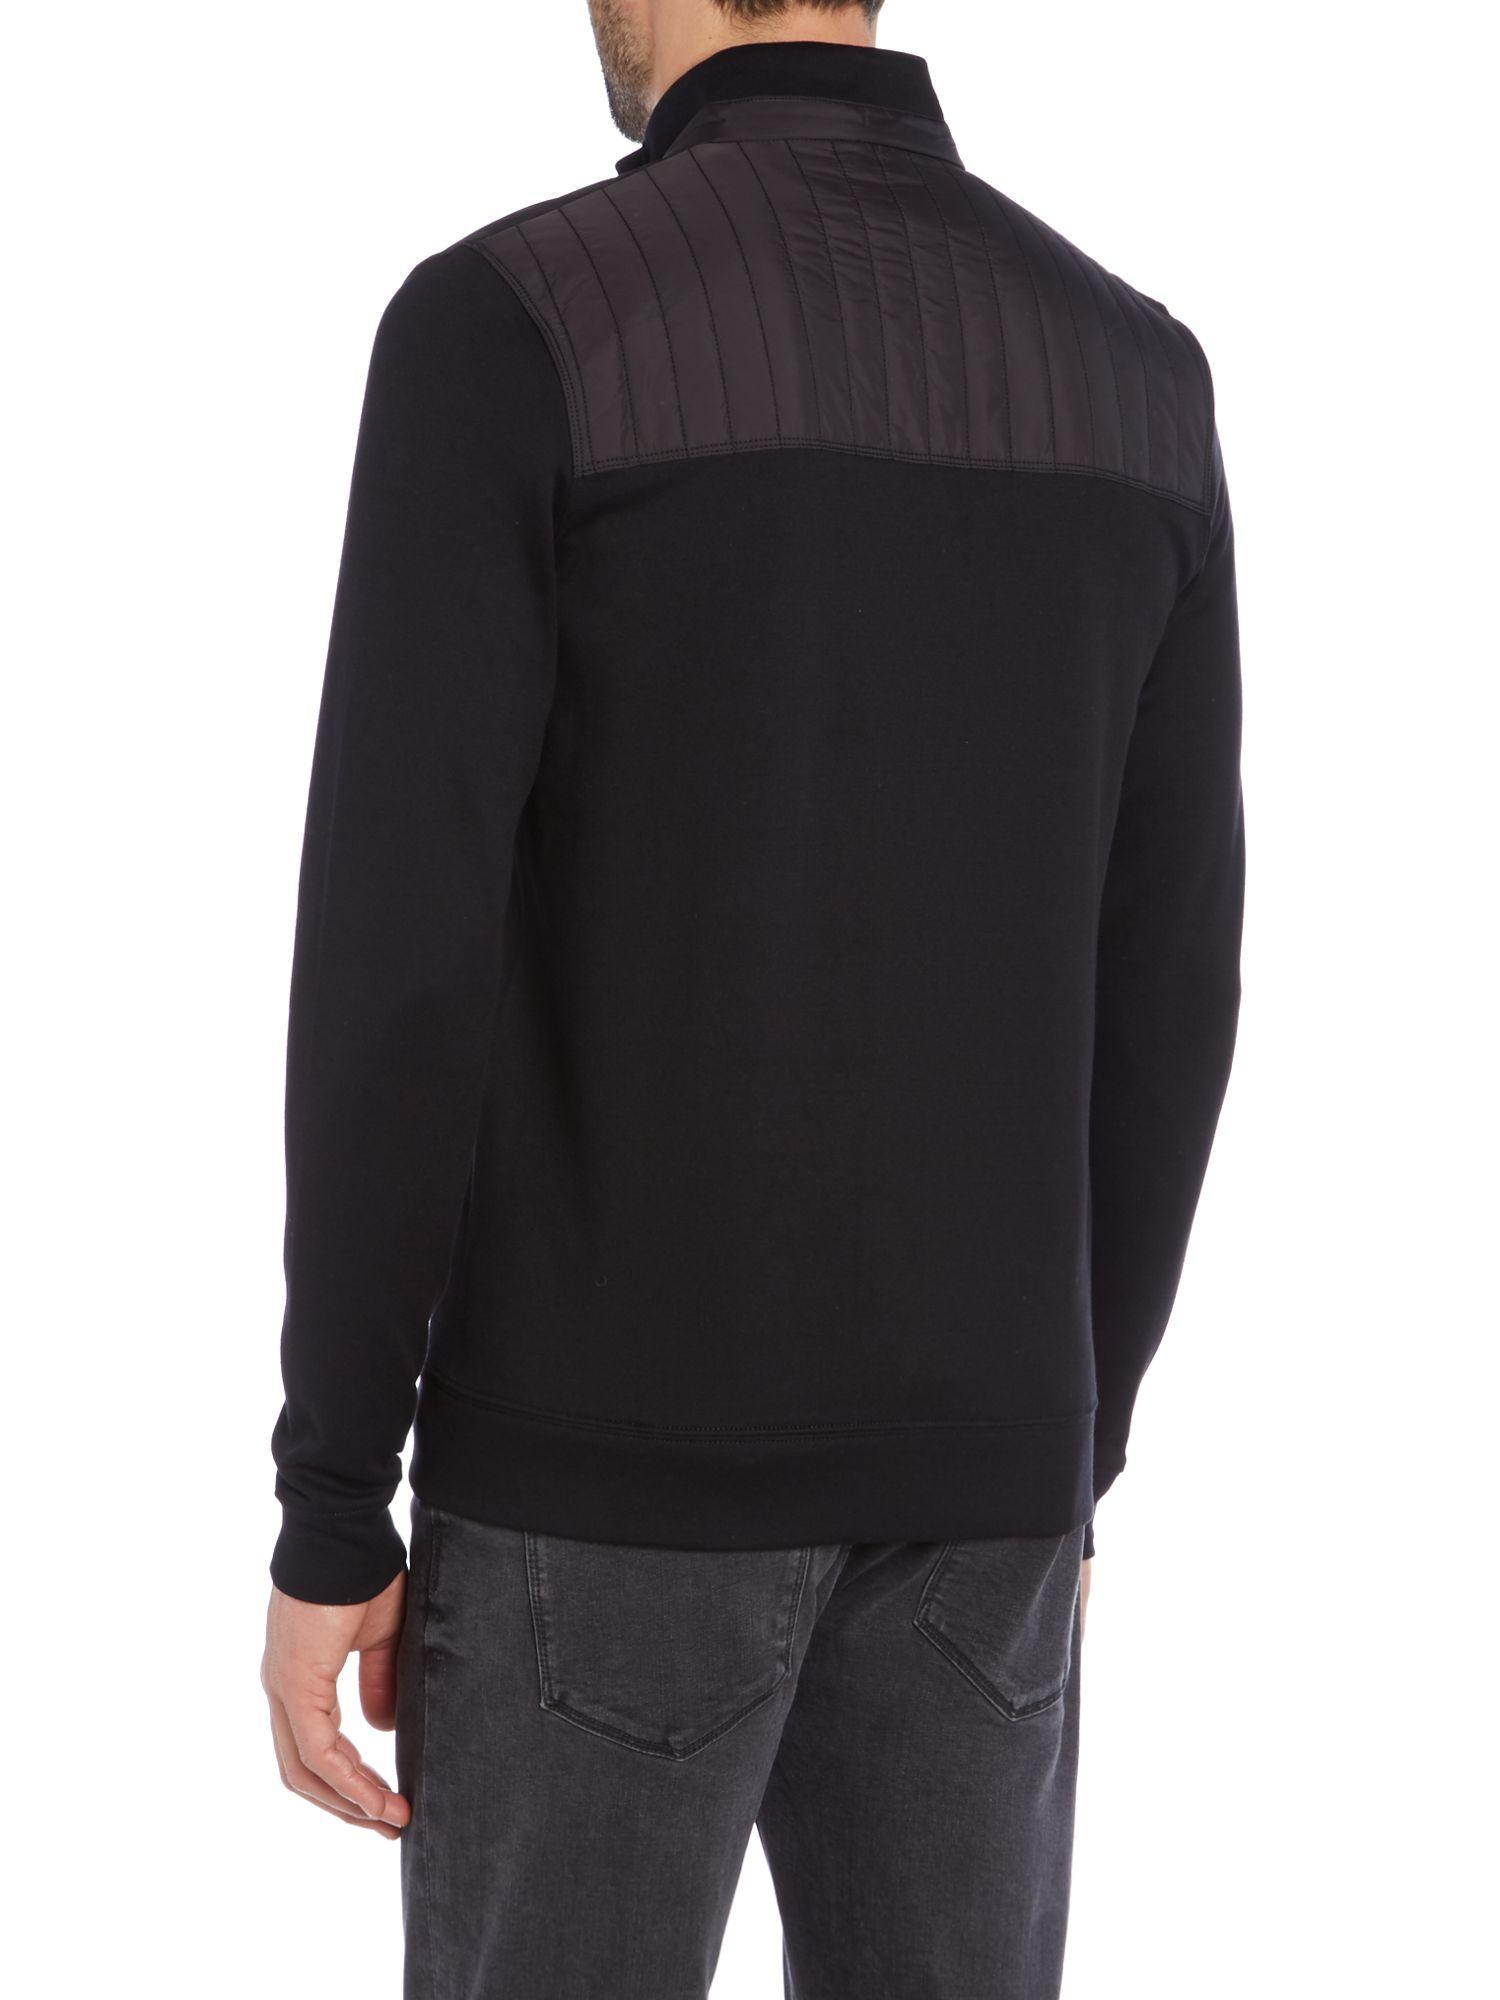 hugo boss black zip up cardigan sweater. Black Bedroom Furniture Sets. Home Design Ideas